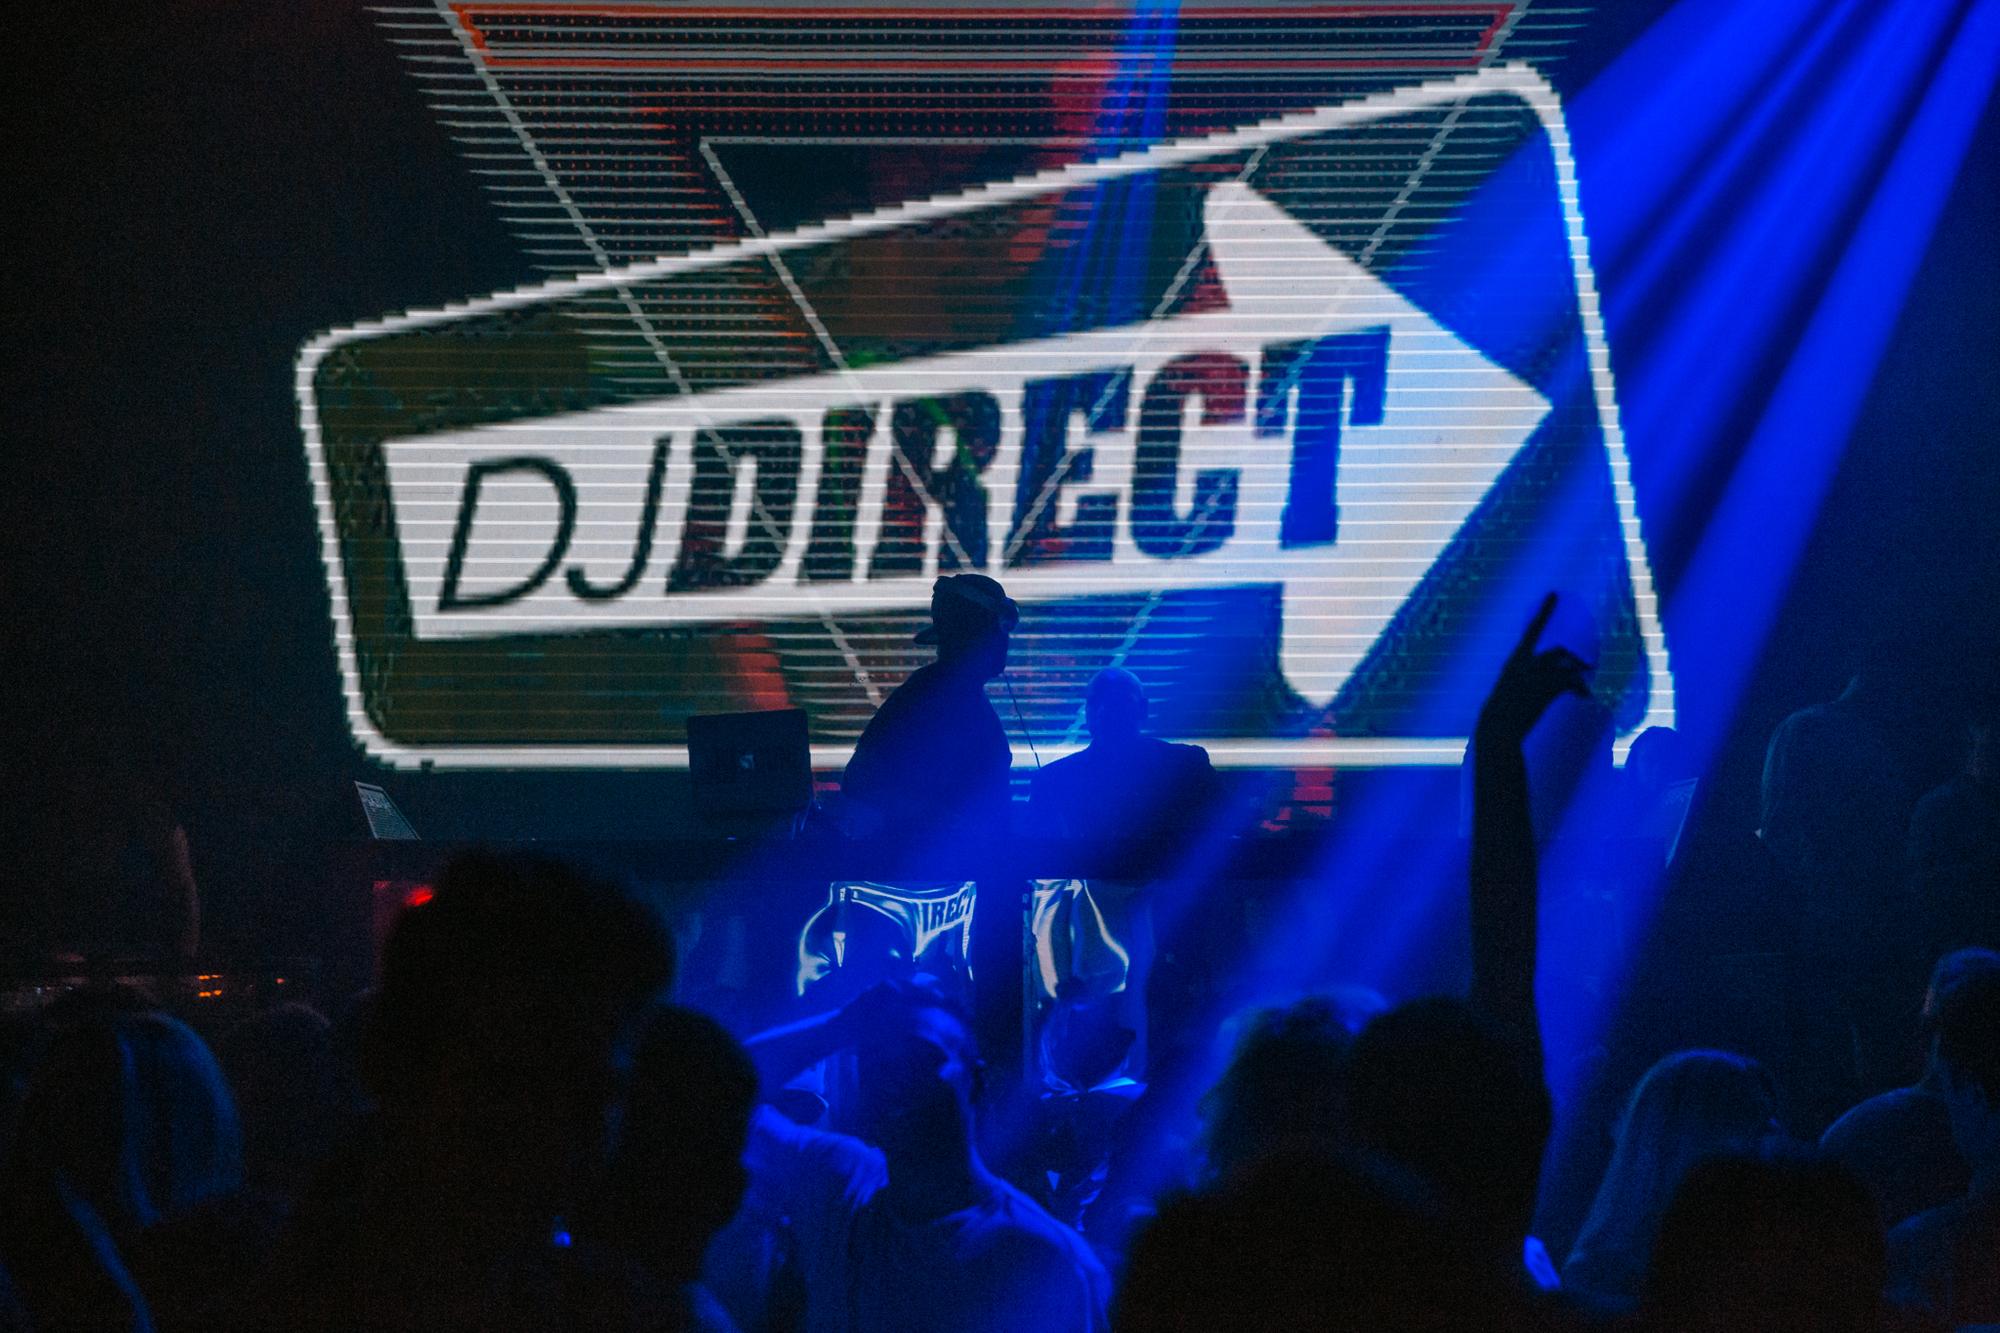 04.06.18 Parq - Direct--1.jpg